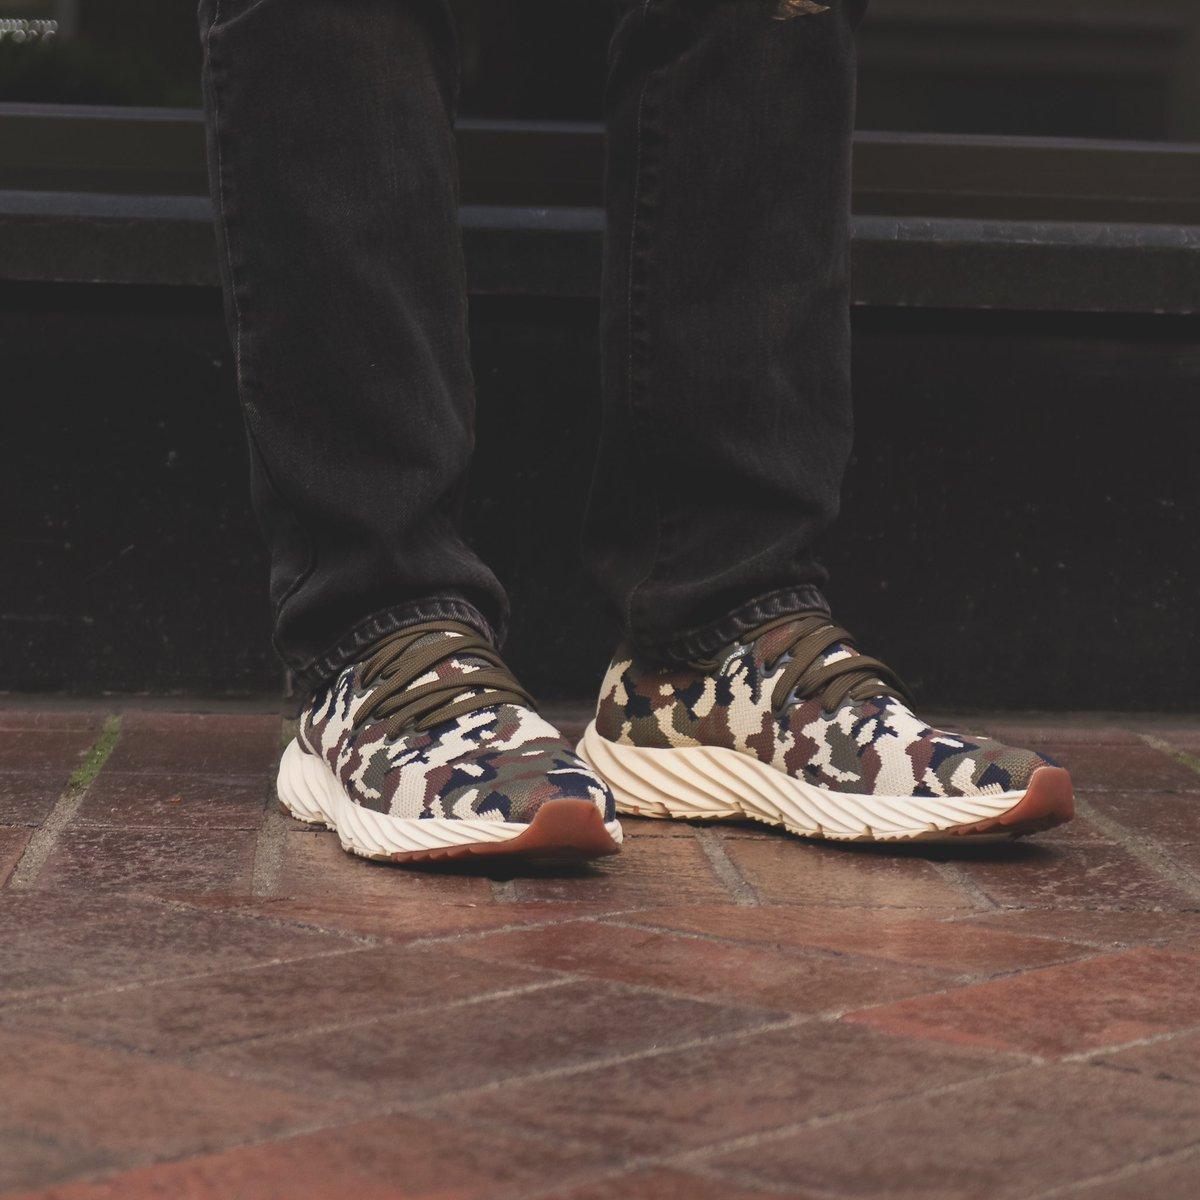 2d5ecc1f6e sneakersforsale hashtag on Twitter